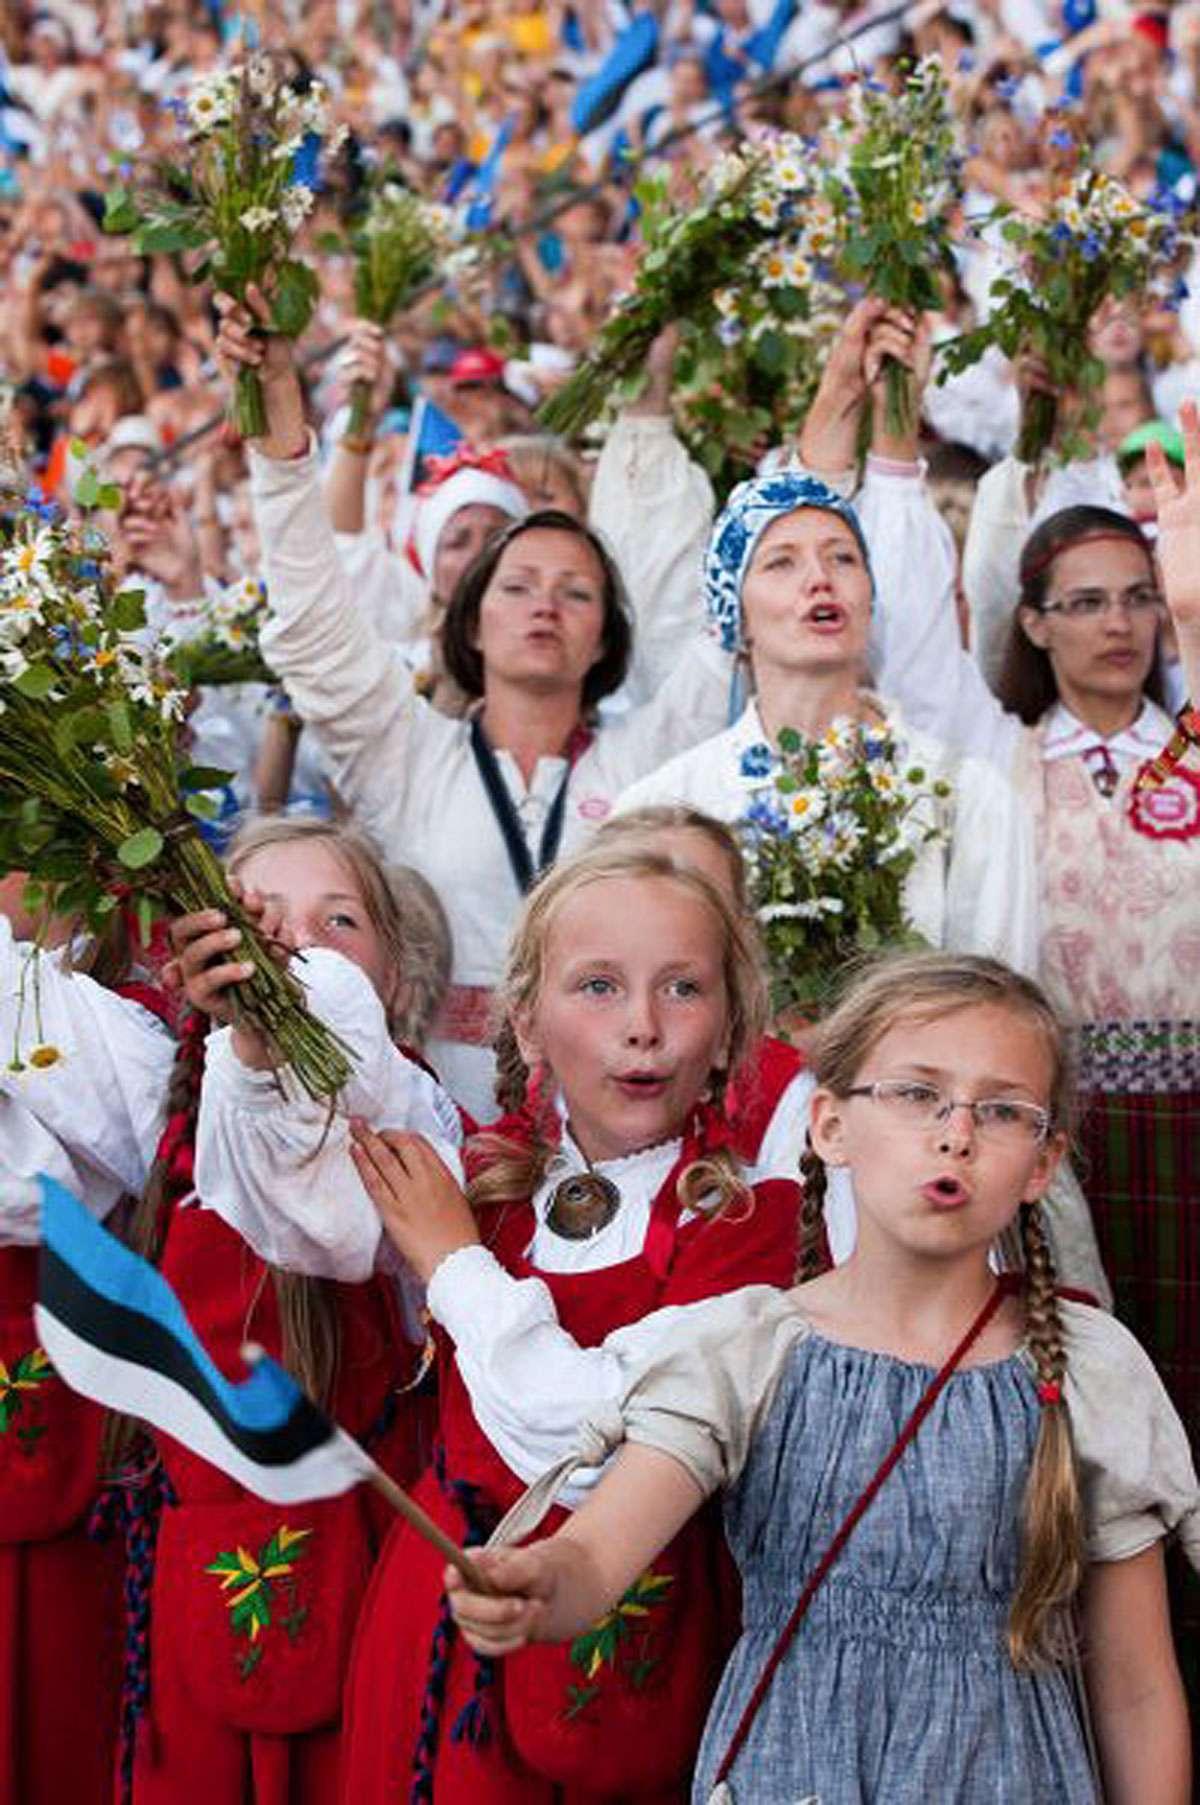 Participants in Estonia Song Festival. Credit: Estonian Song Festival Museum